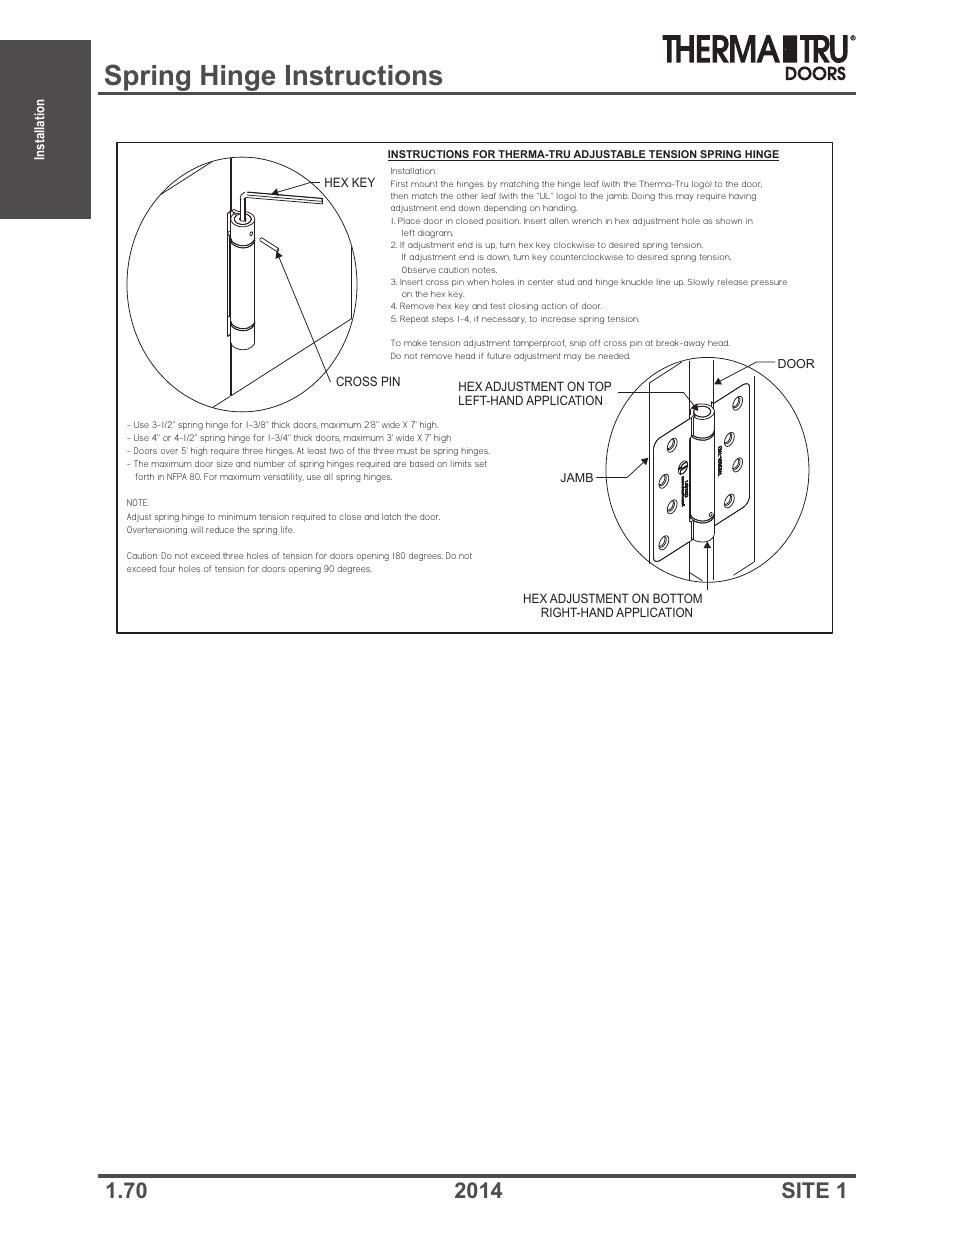 Spring hinge instructions | Therma-Tru Doors Installation User Manual | Page 70 / 76  sc 1 st  manualsdir.com & Spring hinge instructions | Therma-Tru Doors Installation User ...